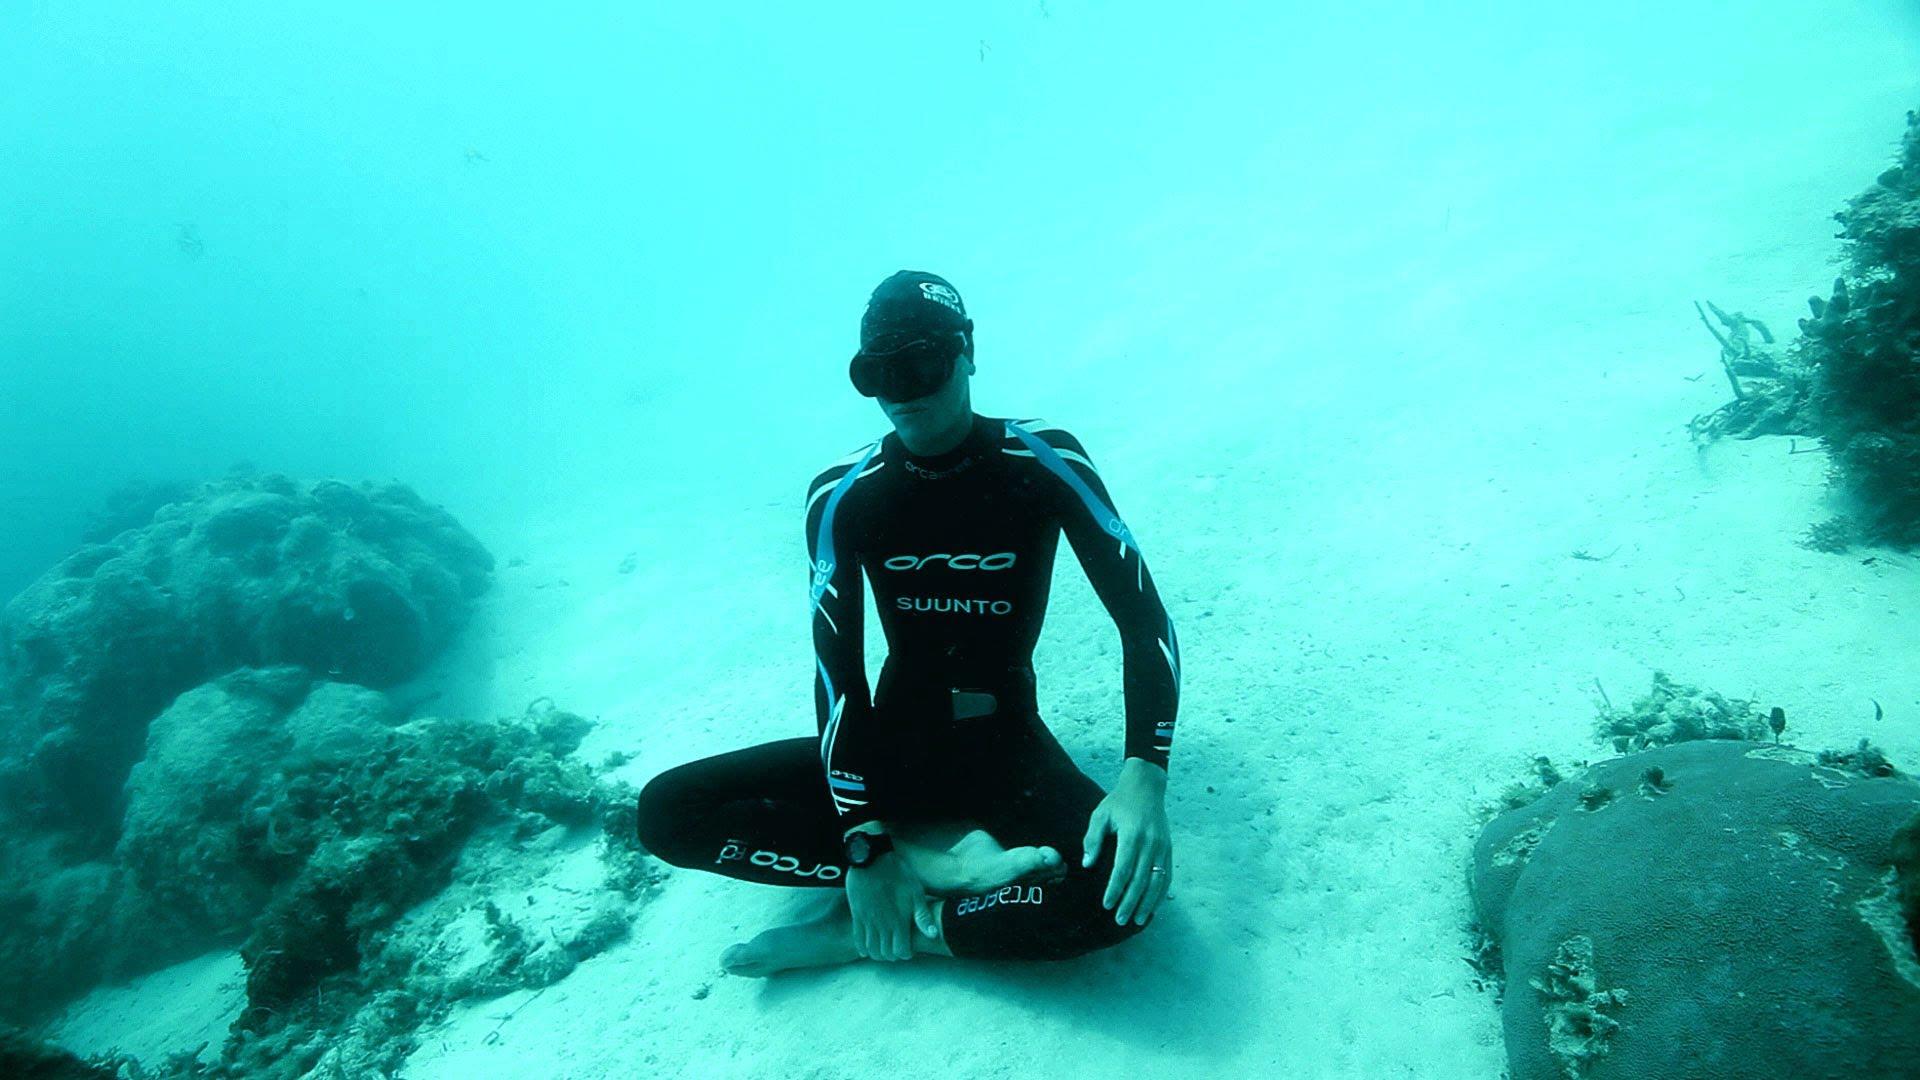 mergulhador bate recorde